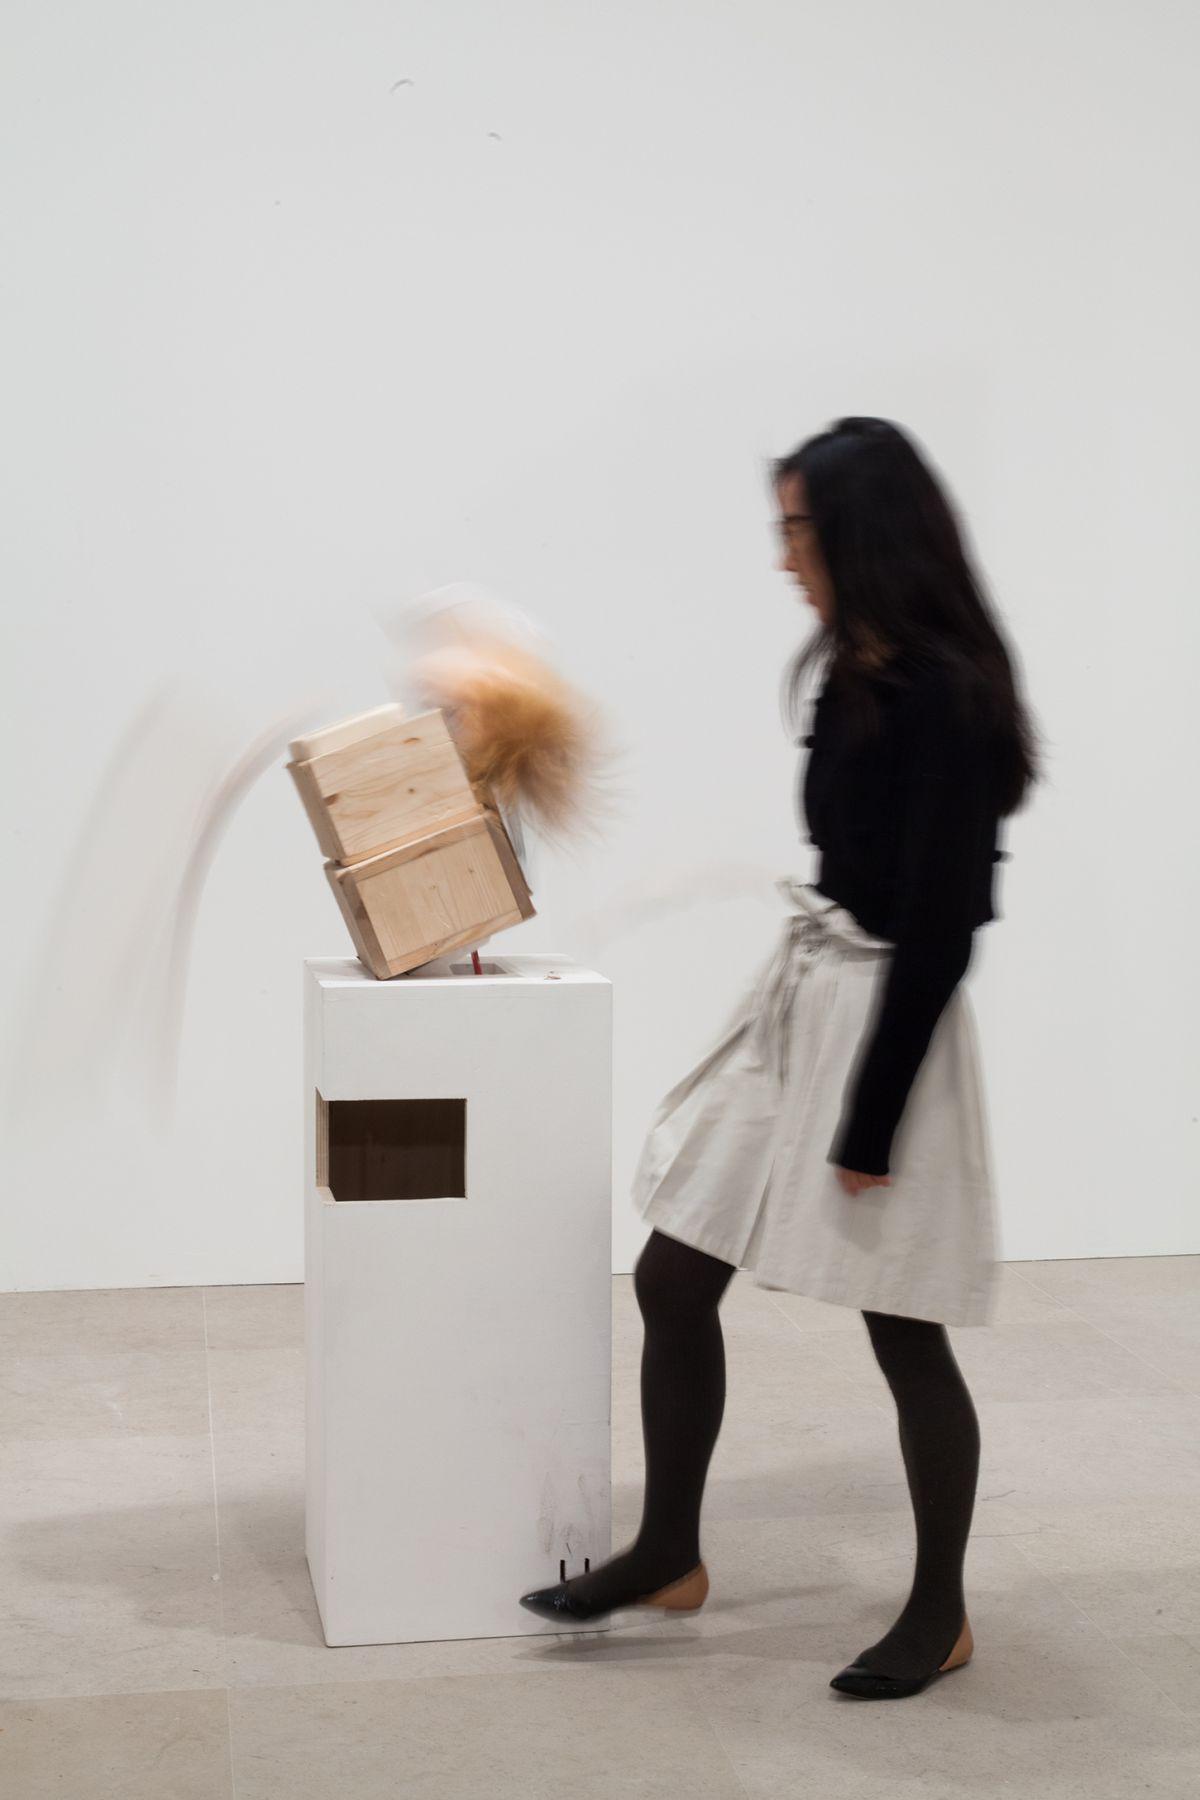 Gelitin, Latte Macchiato, 2012, Mixed media, 77 1/4 x 16 x 18 1/2 inches